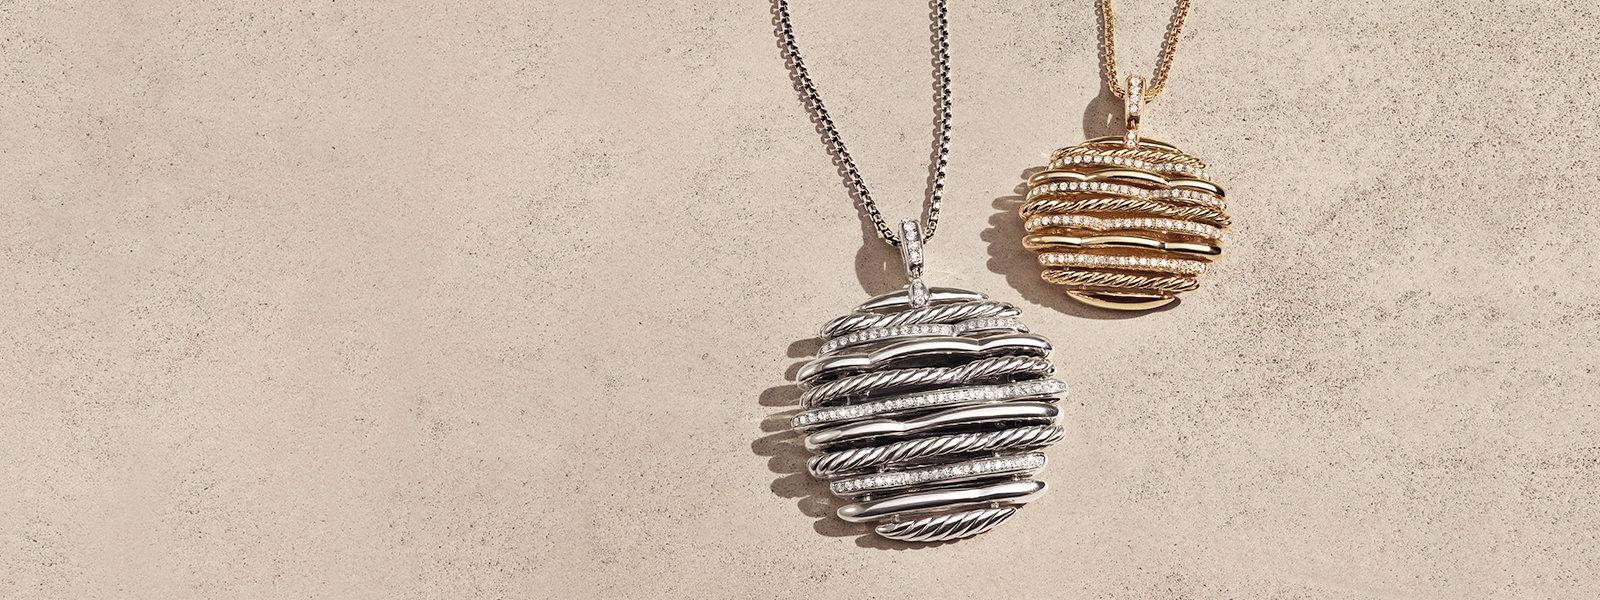 David Yurman Tides 925纯银或18K黄金镶白钻吊坠项链,彼此相邻摆放,置于浅色纹理石头上,投下影子。